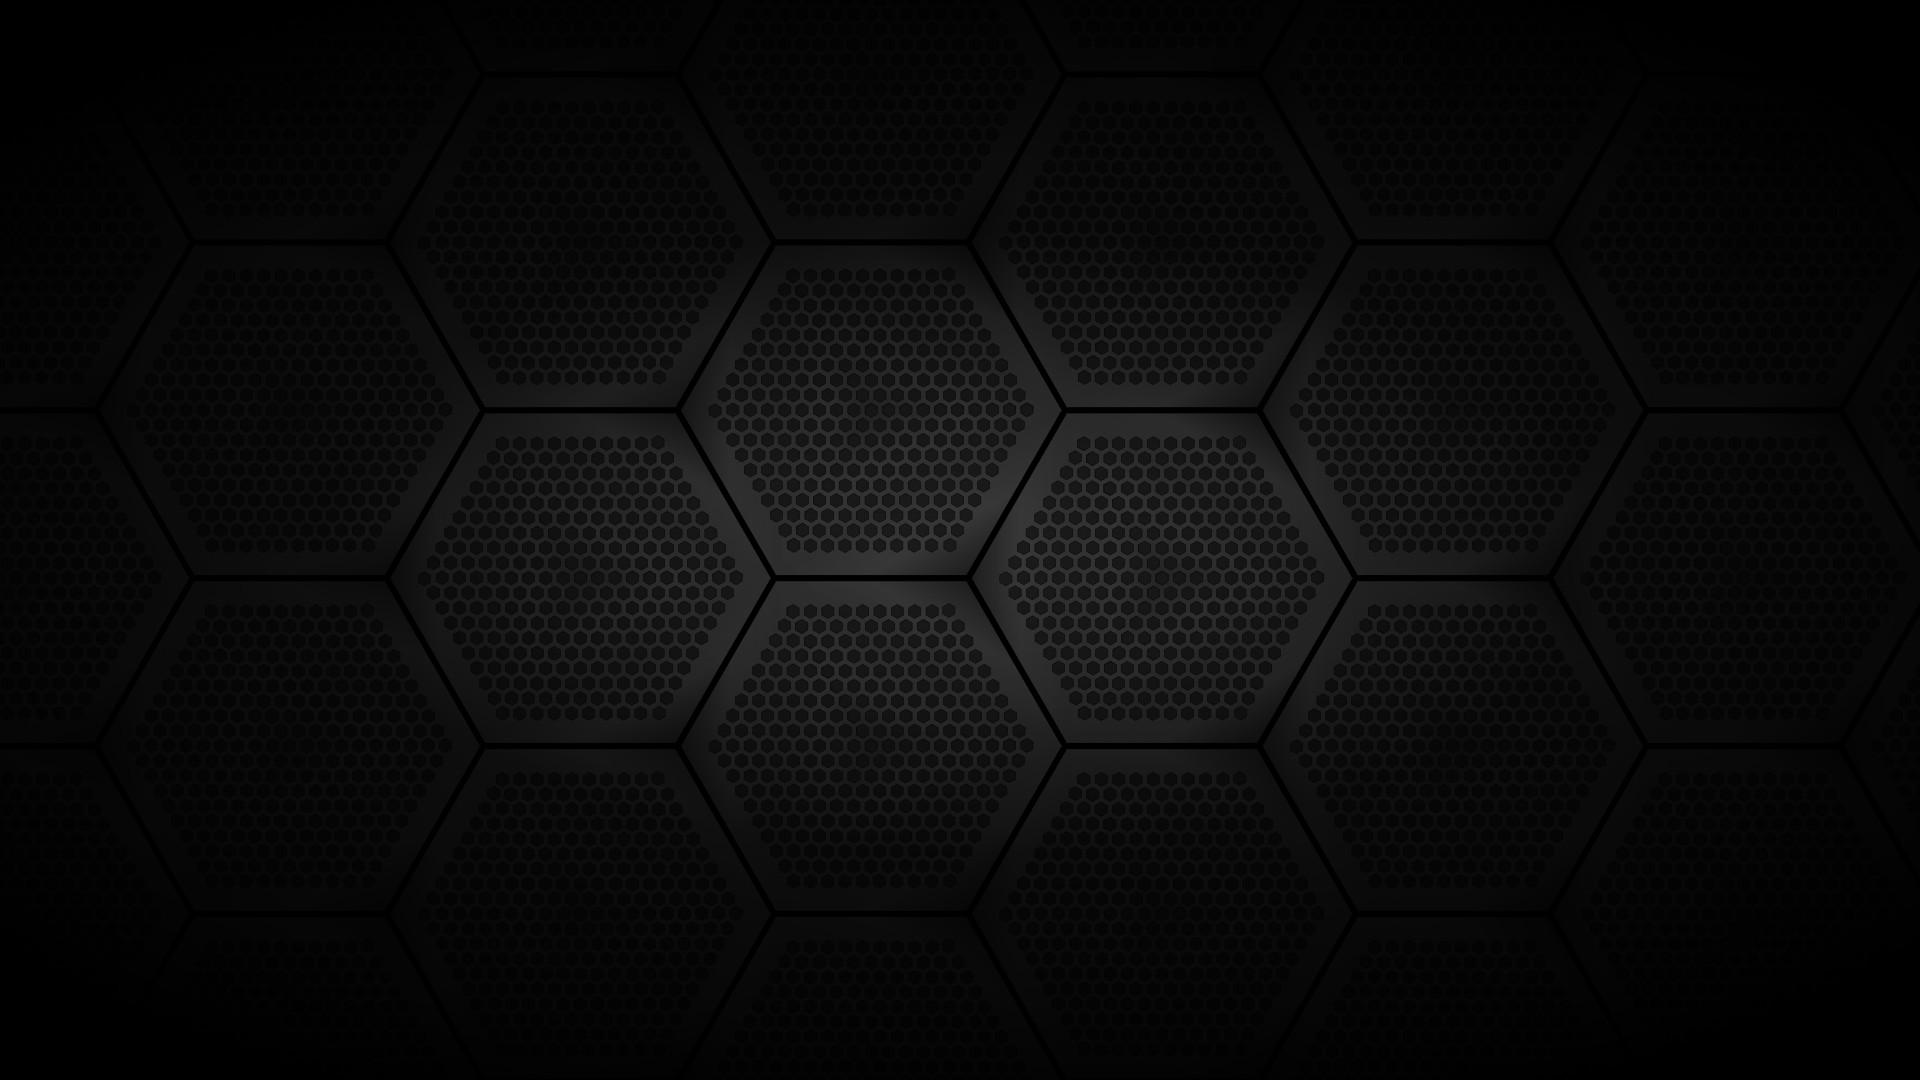 Chrome metal wallpaper 55 images - Hd pattern wallpapers 1080p ...